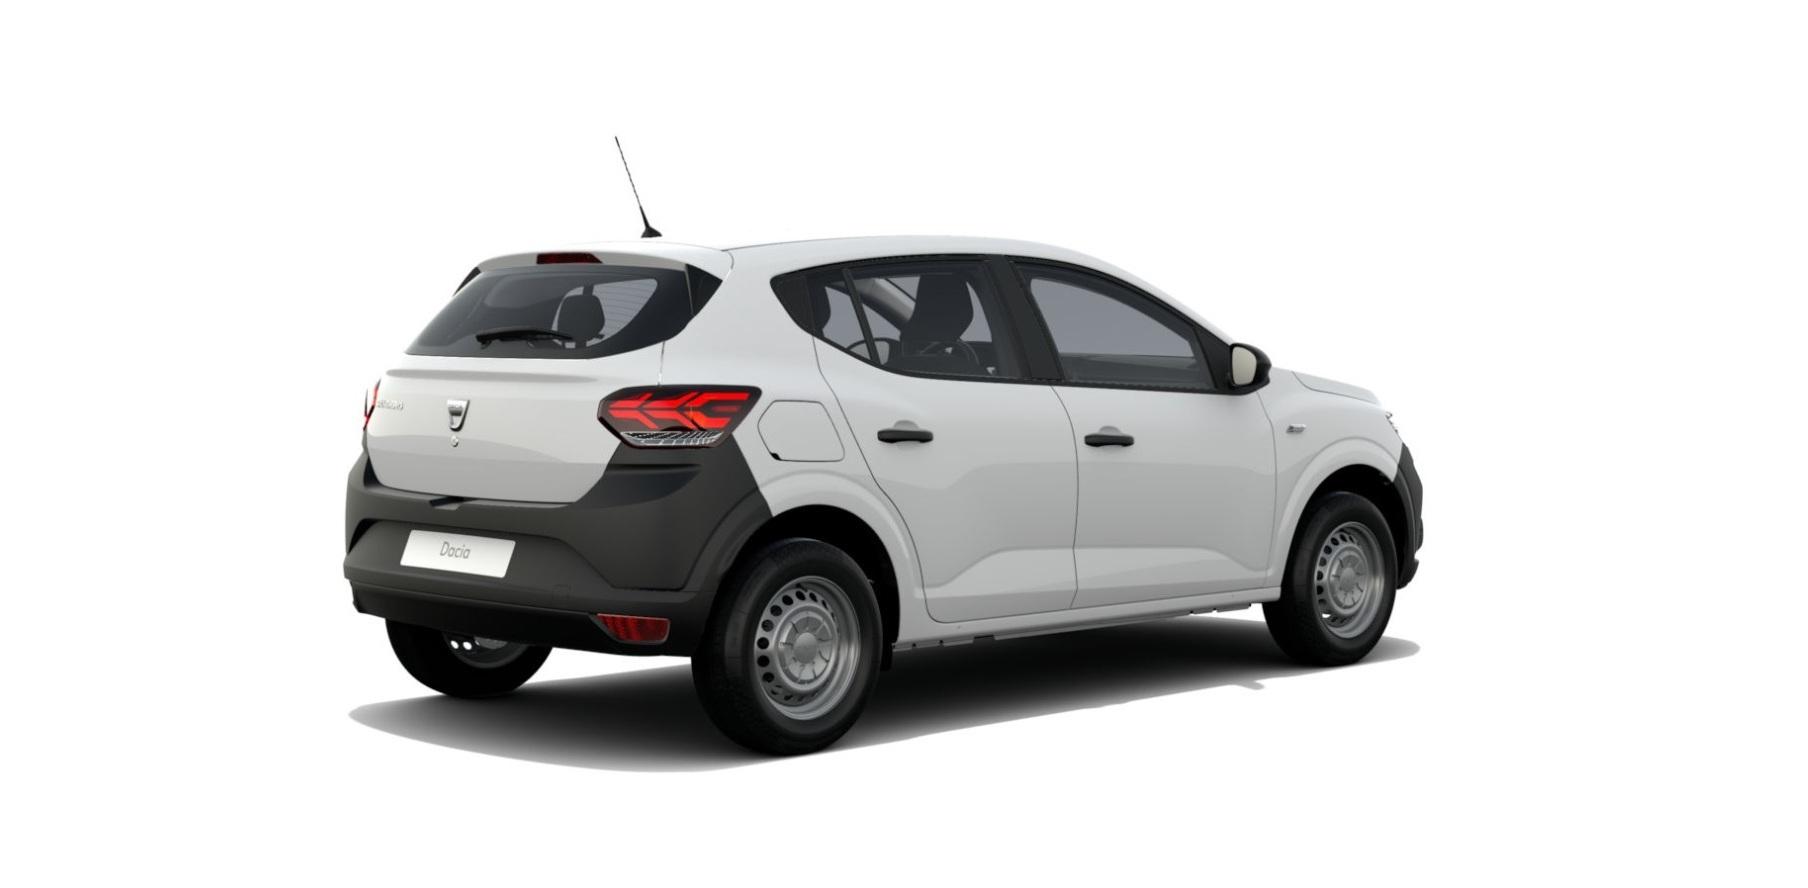 Dacia Sandero Access 02